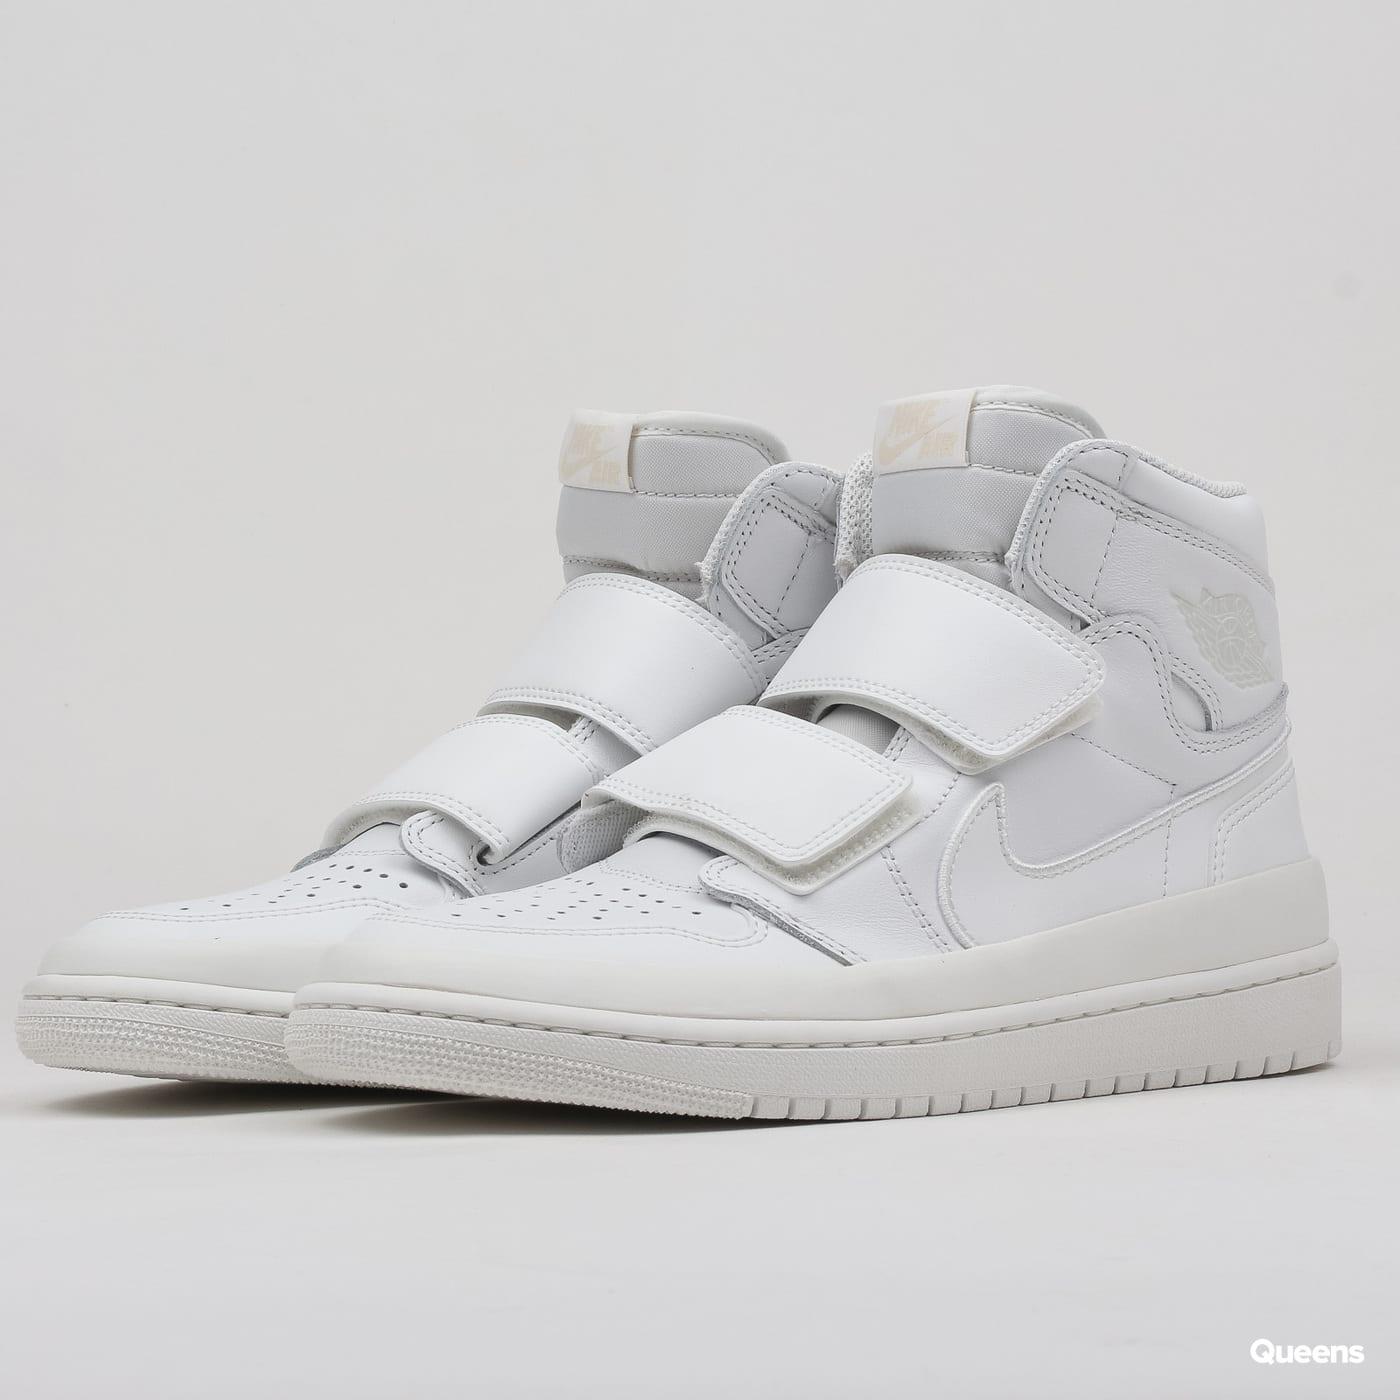 promo code c0de3 4eb7a Jordan Air Jordan 1 Retro HI Double Strap summit white / light cream